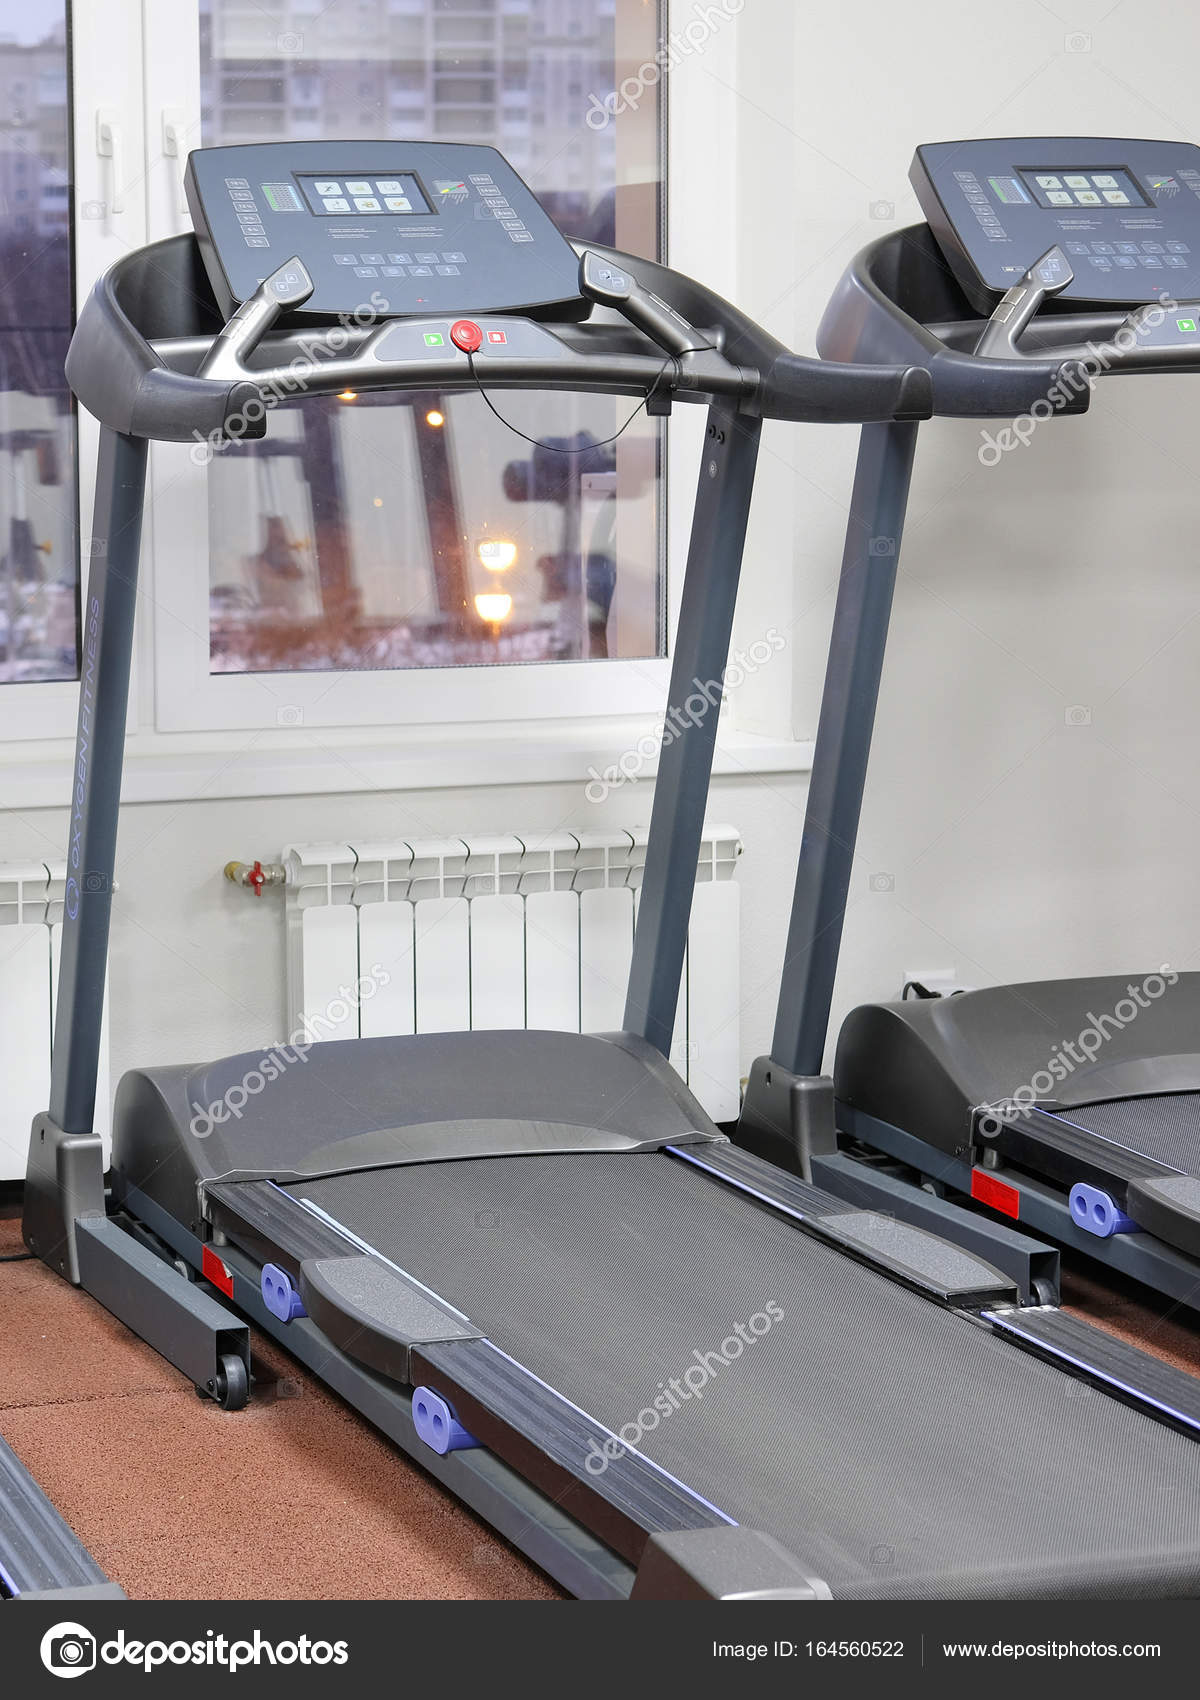 f7327906df0 Όργανα γυμναστικής στην αίθουσα γυμναστικής — Φωτογραφία Αρχείου ...